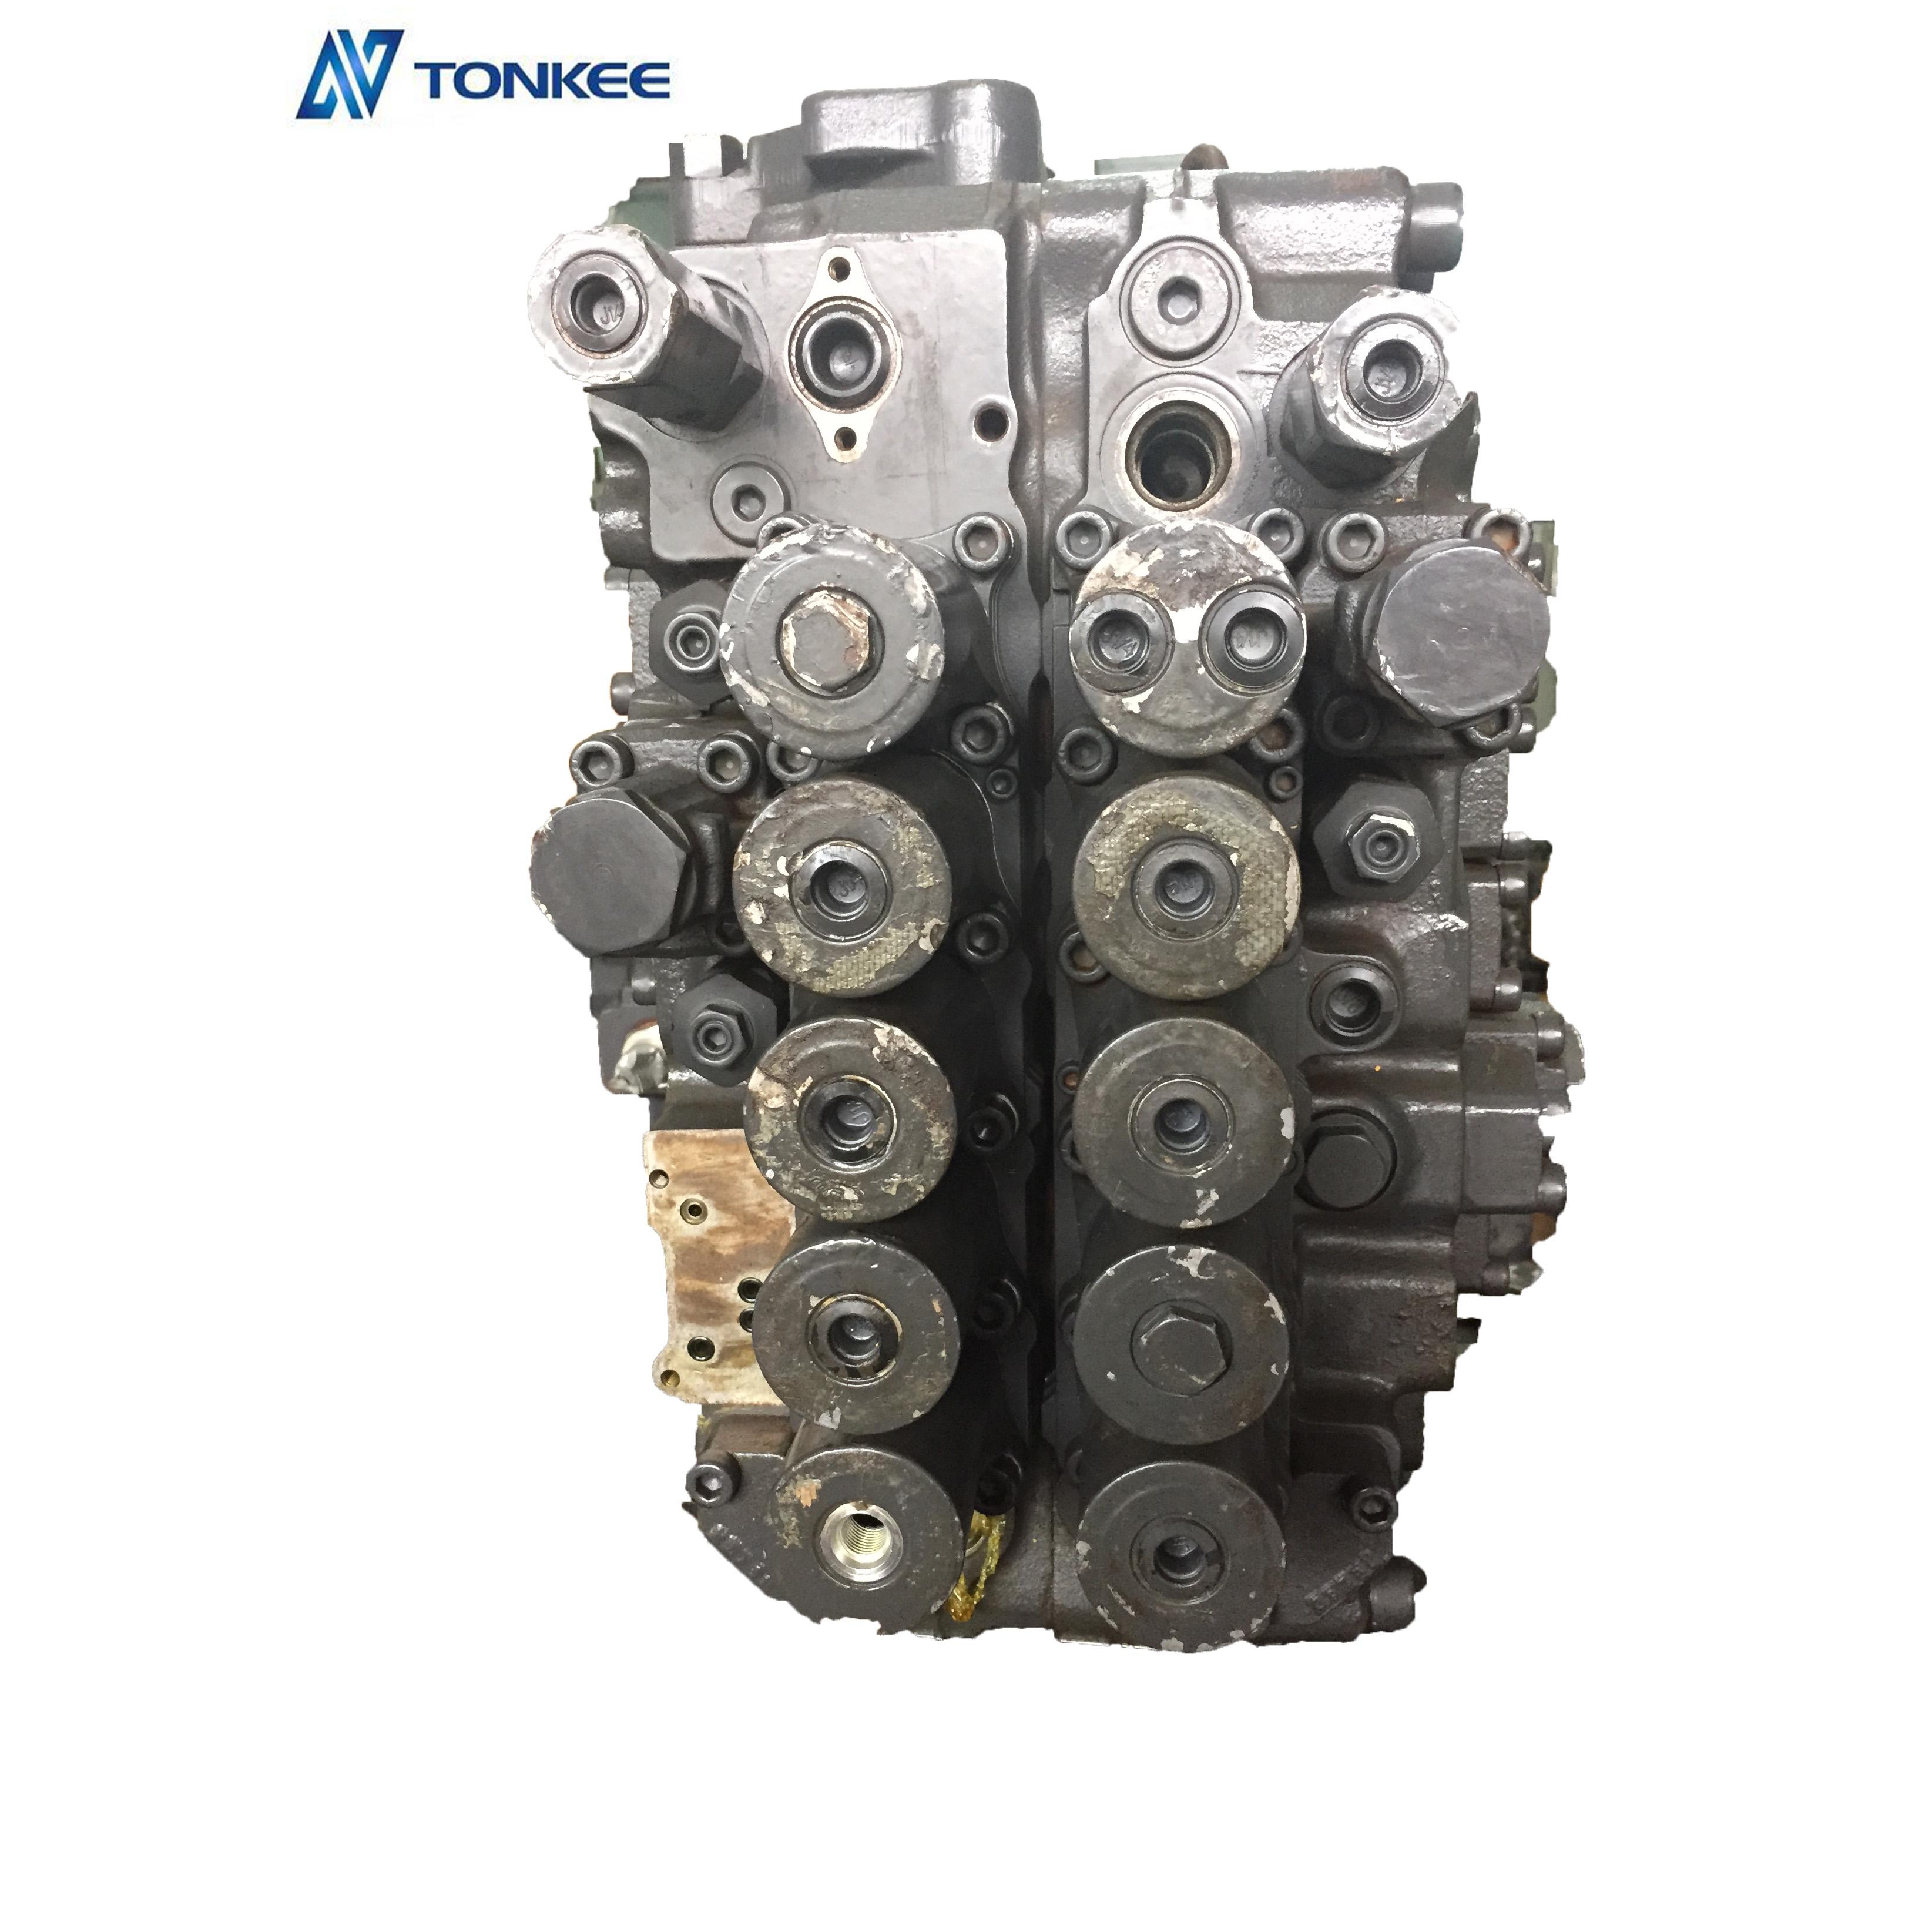 SK200 control valve SK200-5 Hydraulic control valve SK200-5 EXCAVATOR Main control valve for KOBELCO